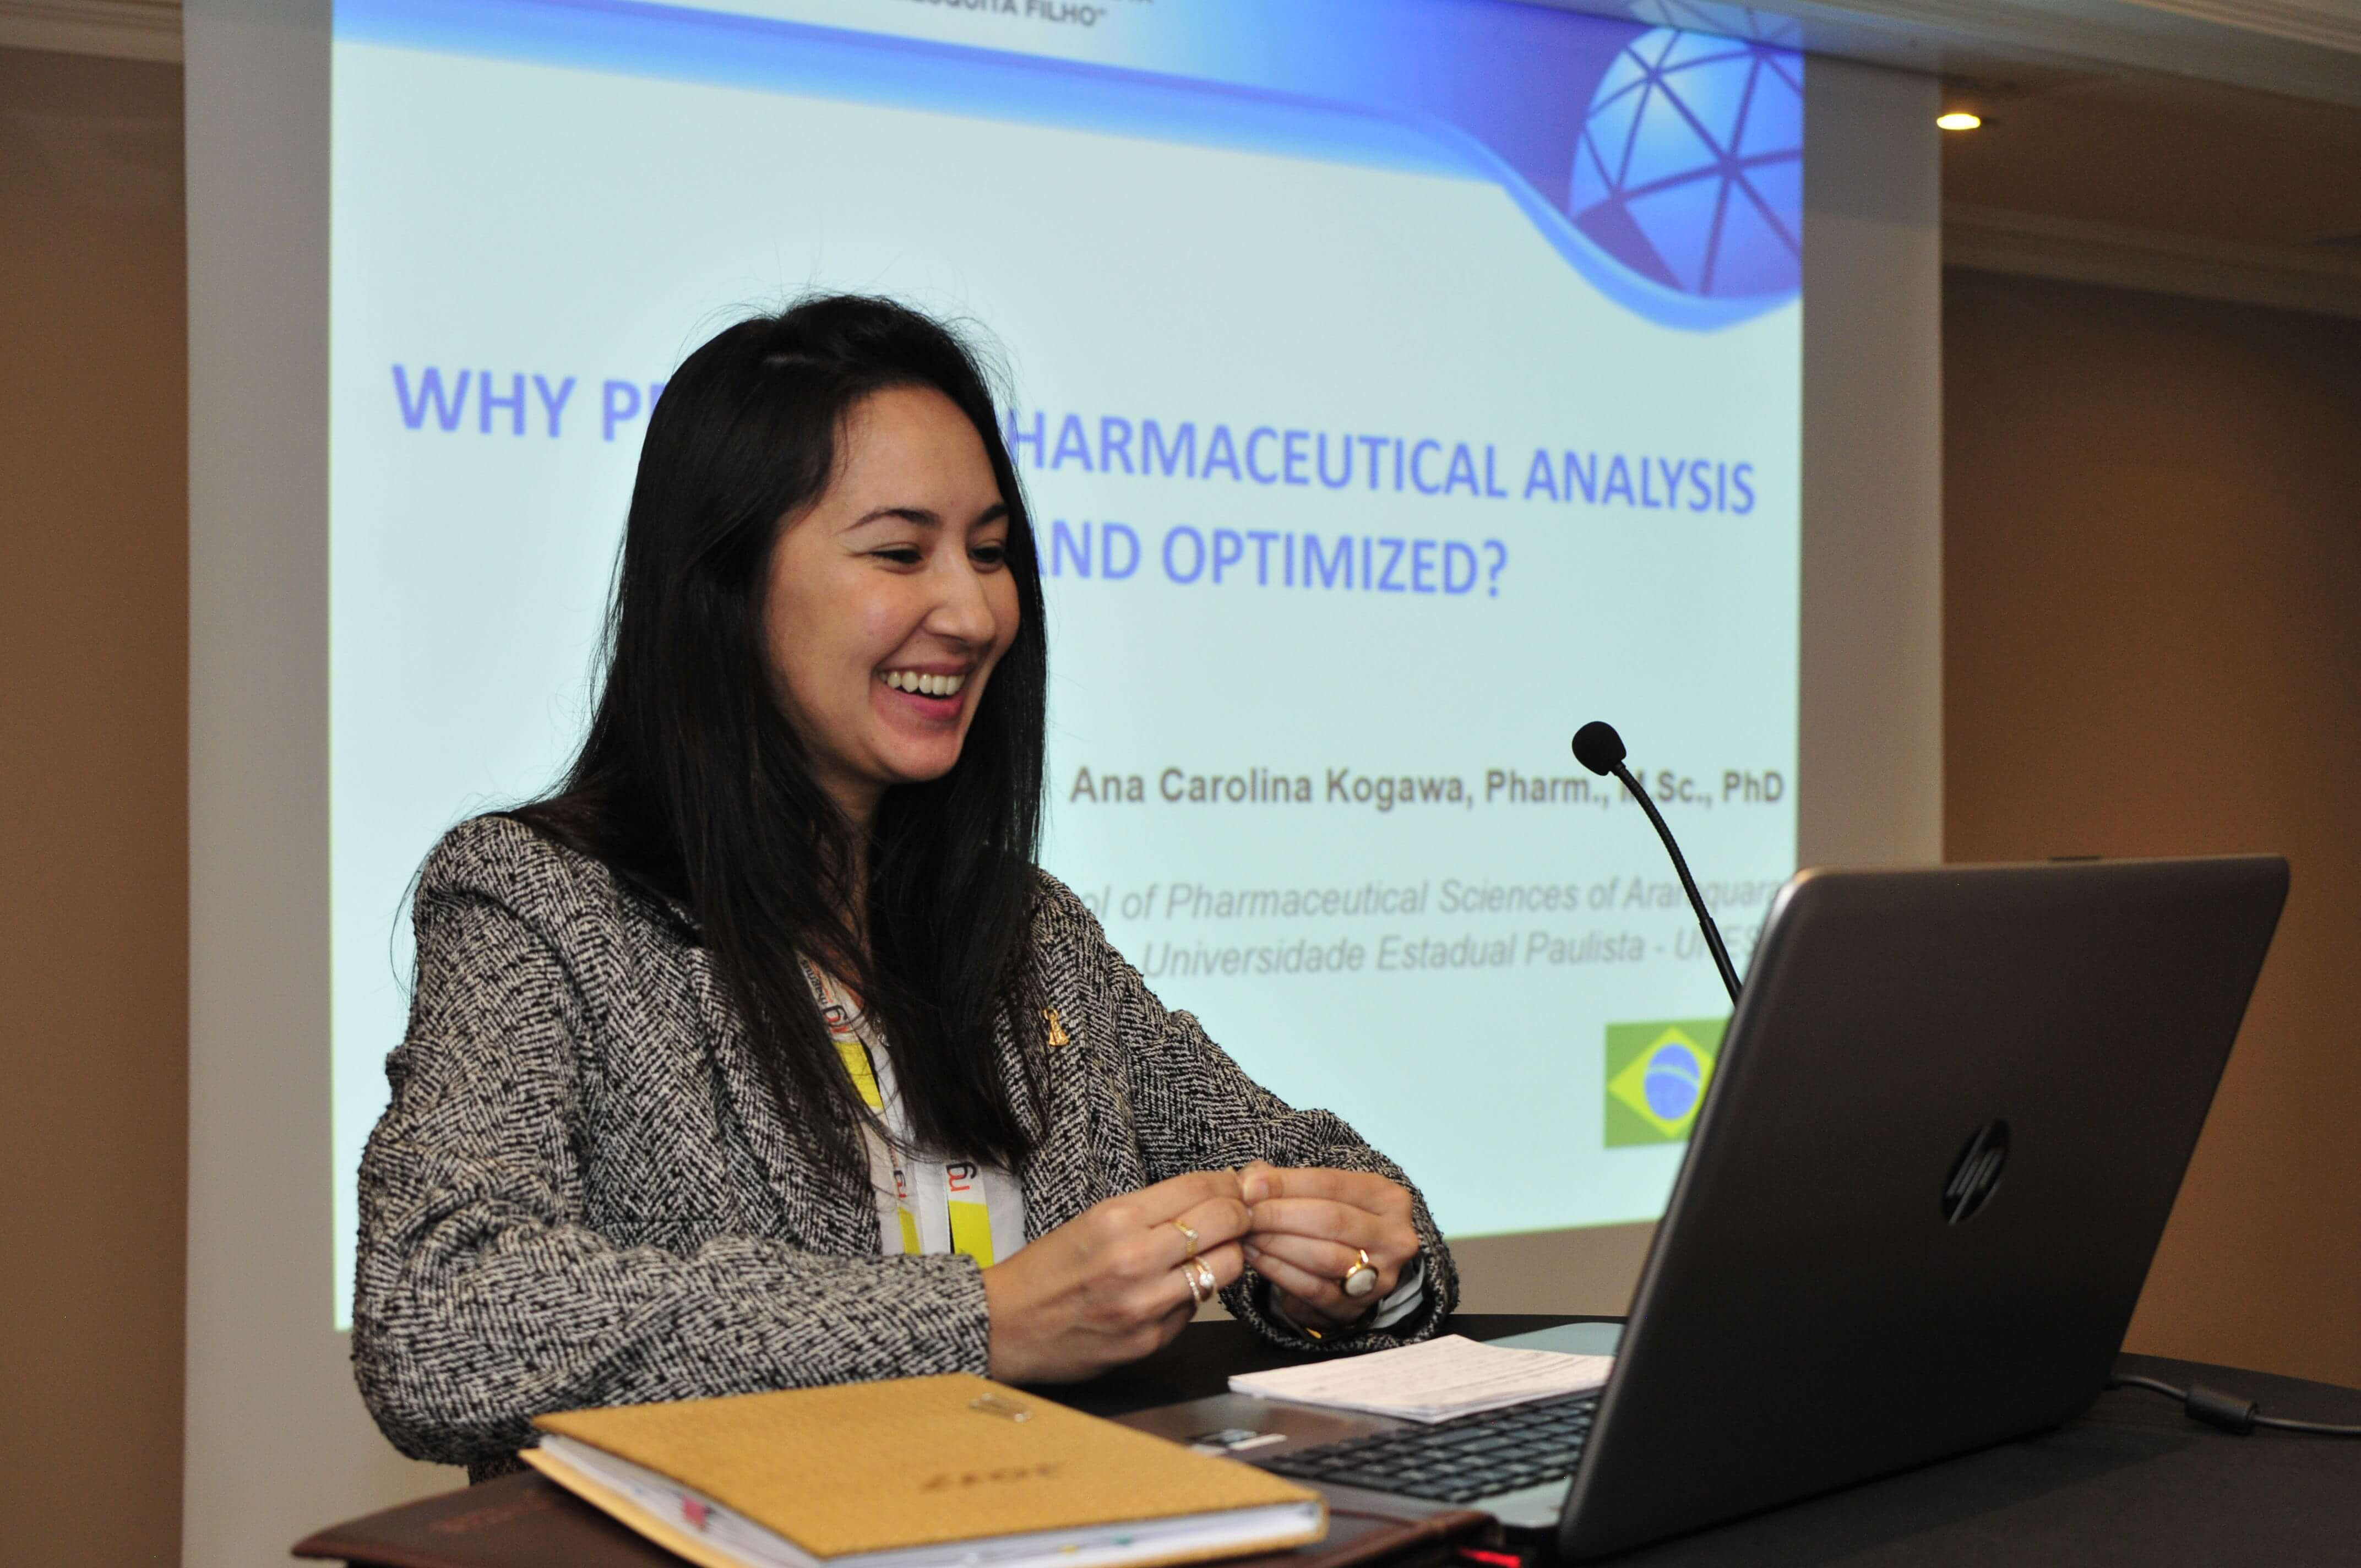 Leading speakers for Pharma Conferences 2020-Ana Carolina Kogawa